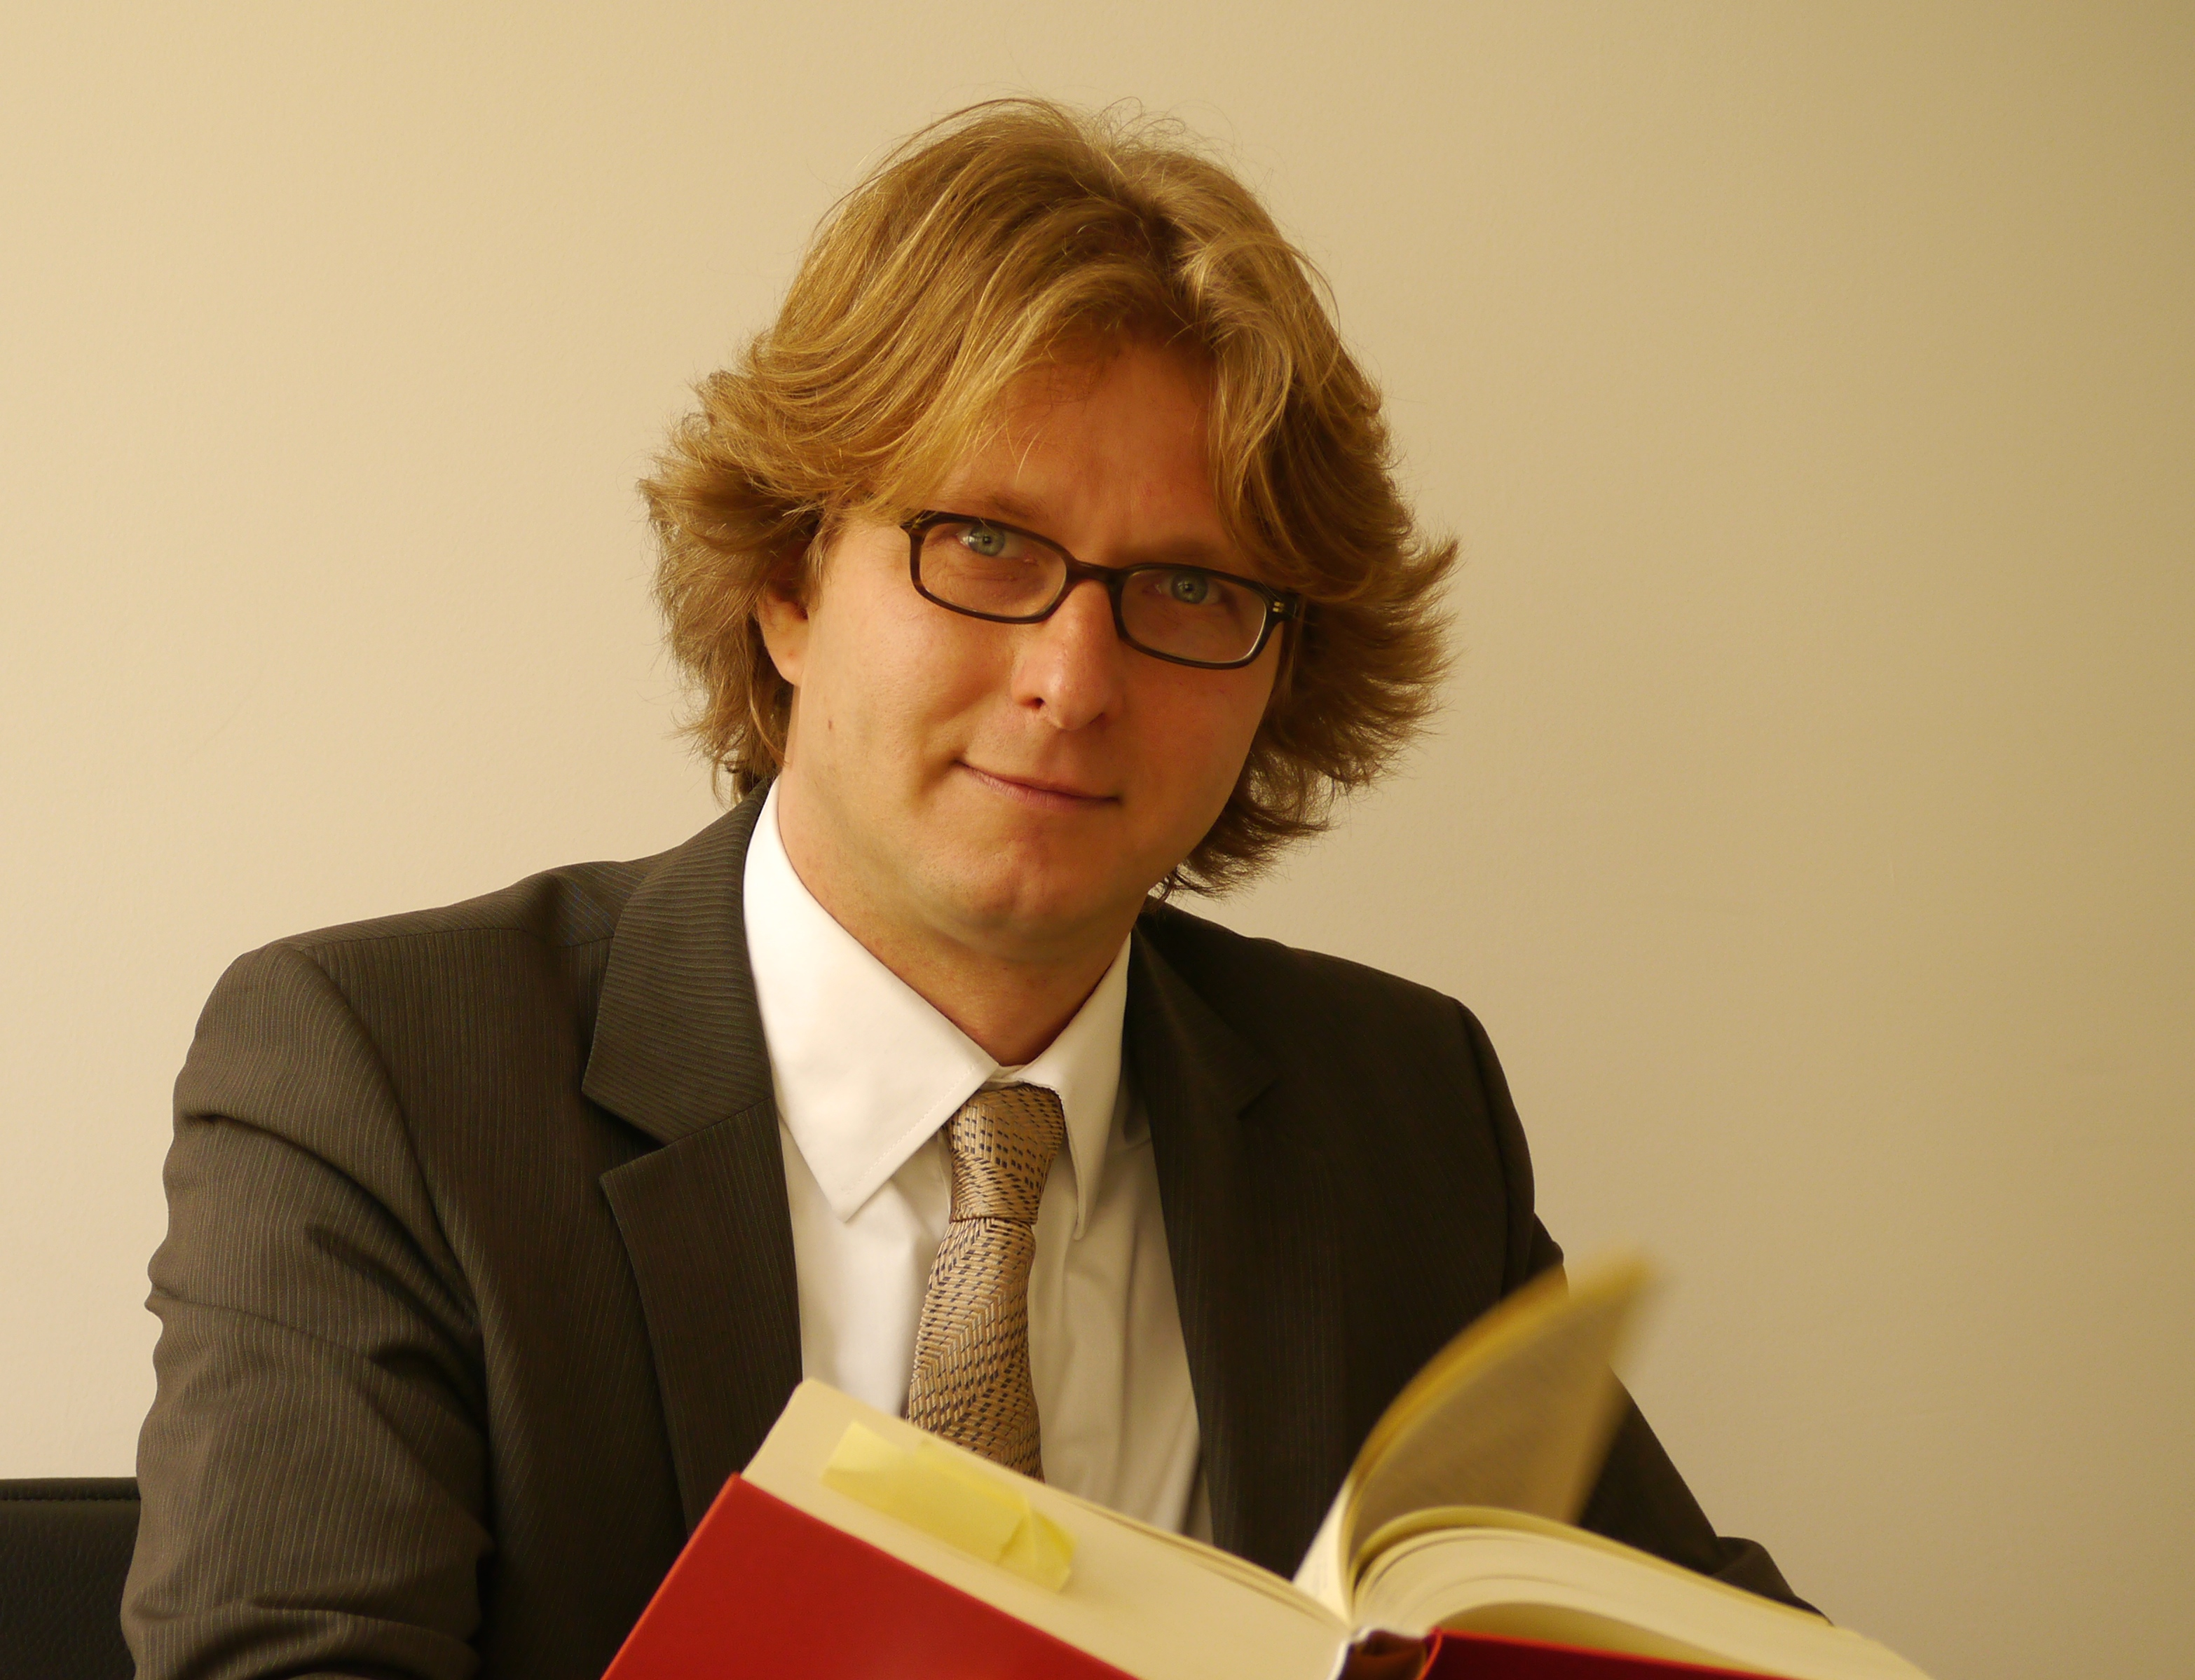 Sascha Petzold - Rechtsanwalt & Mediator